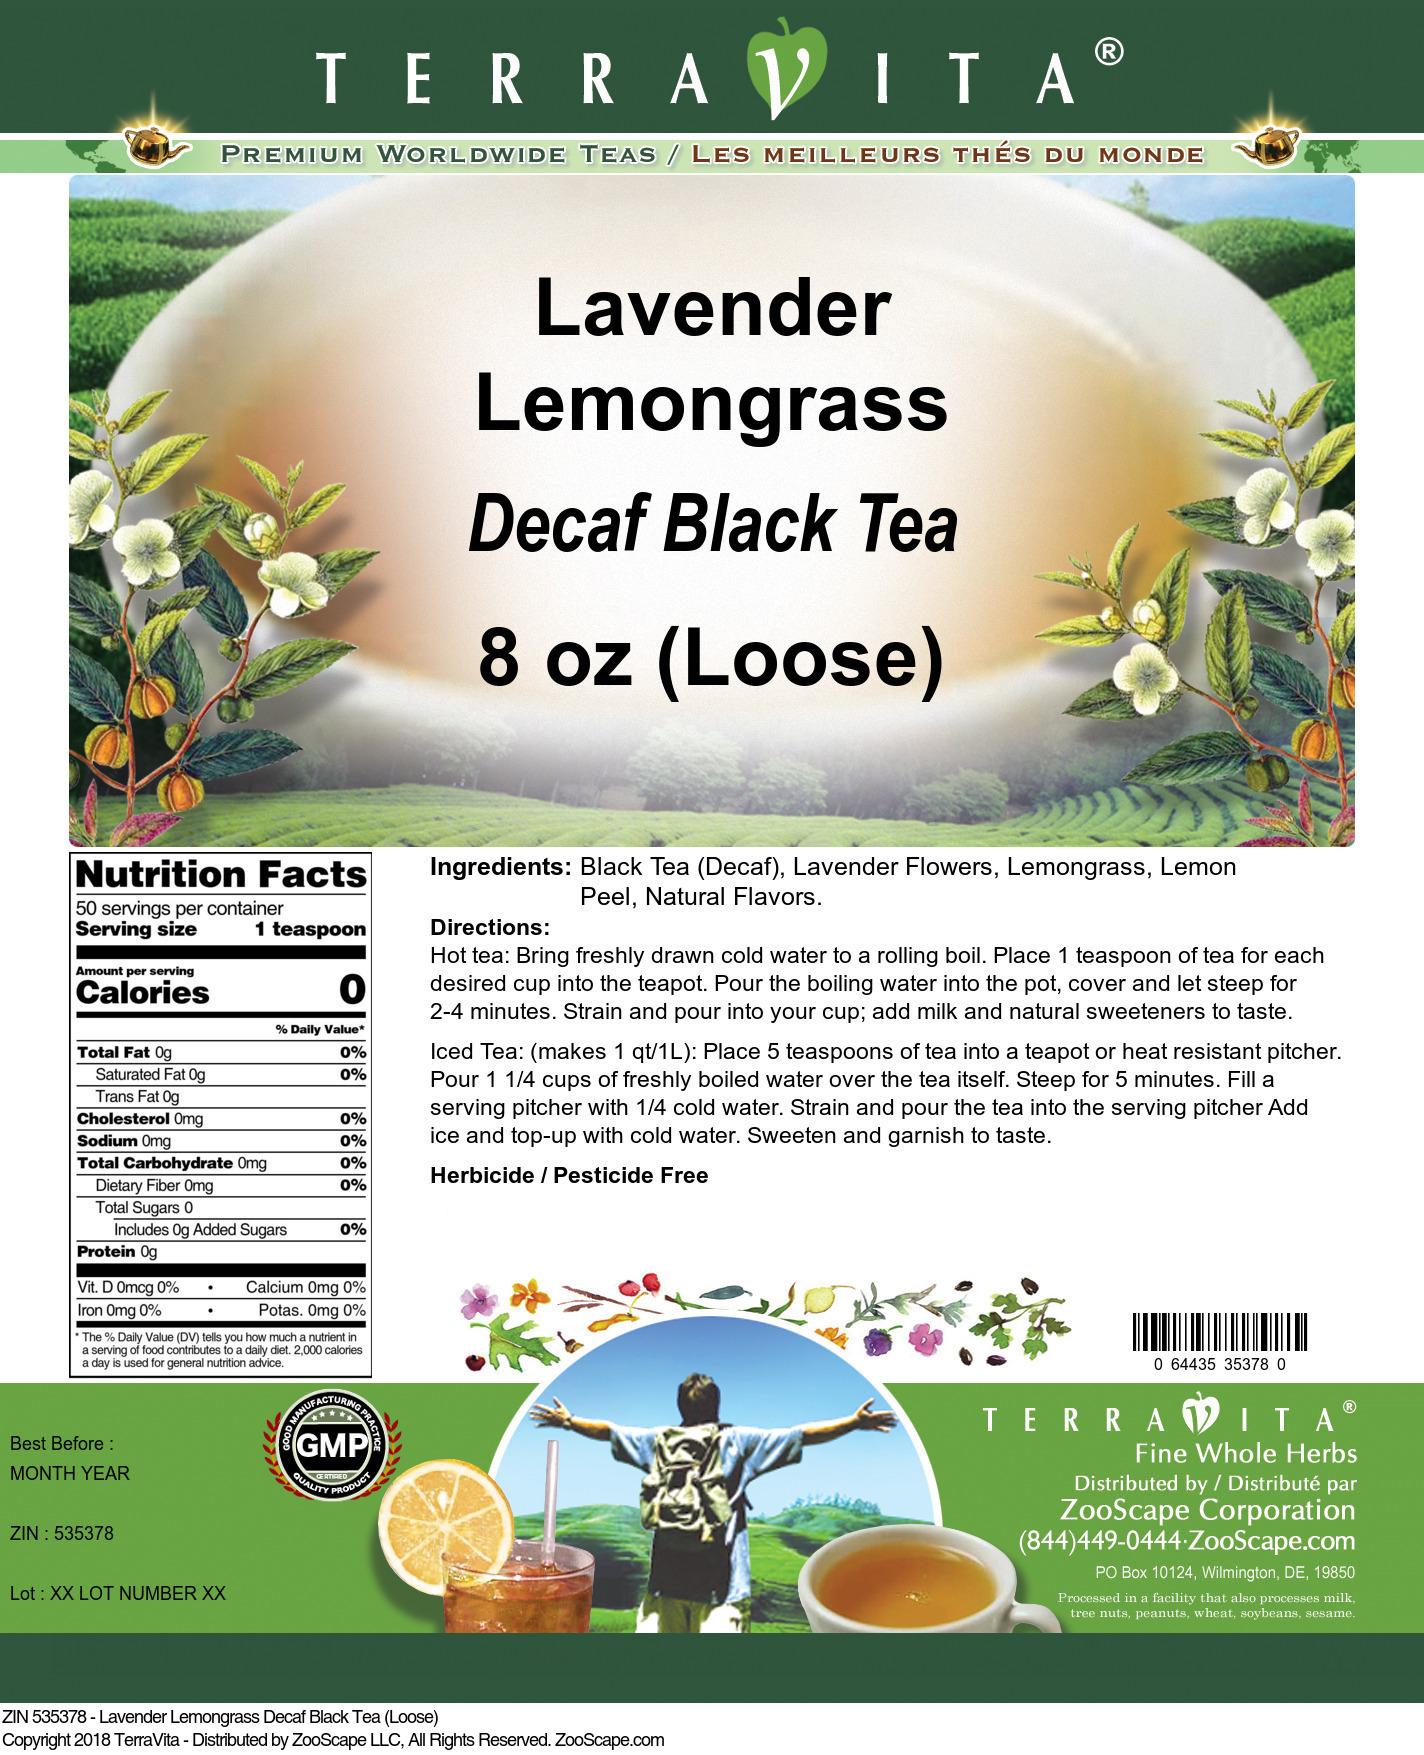 Lavender Lemongrass Decaf Black Tea